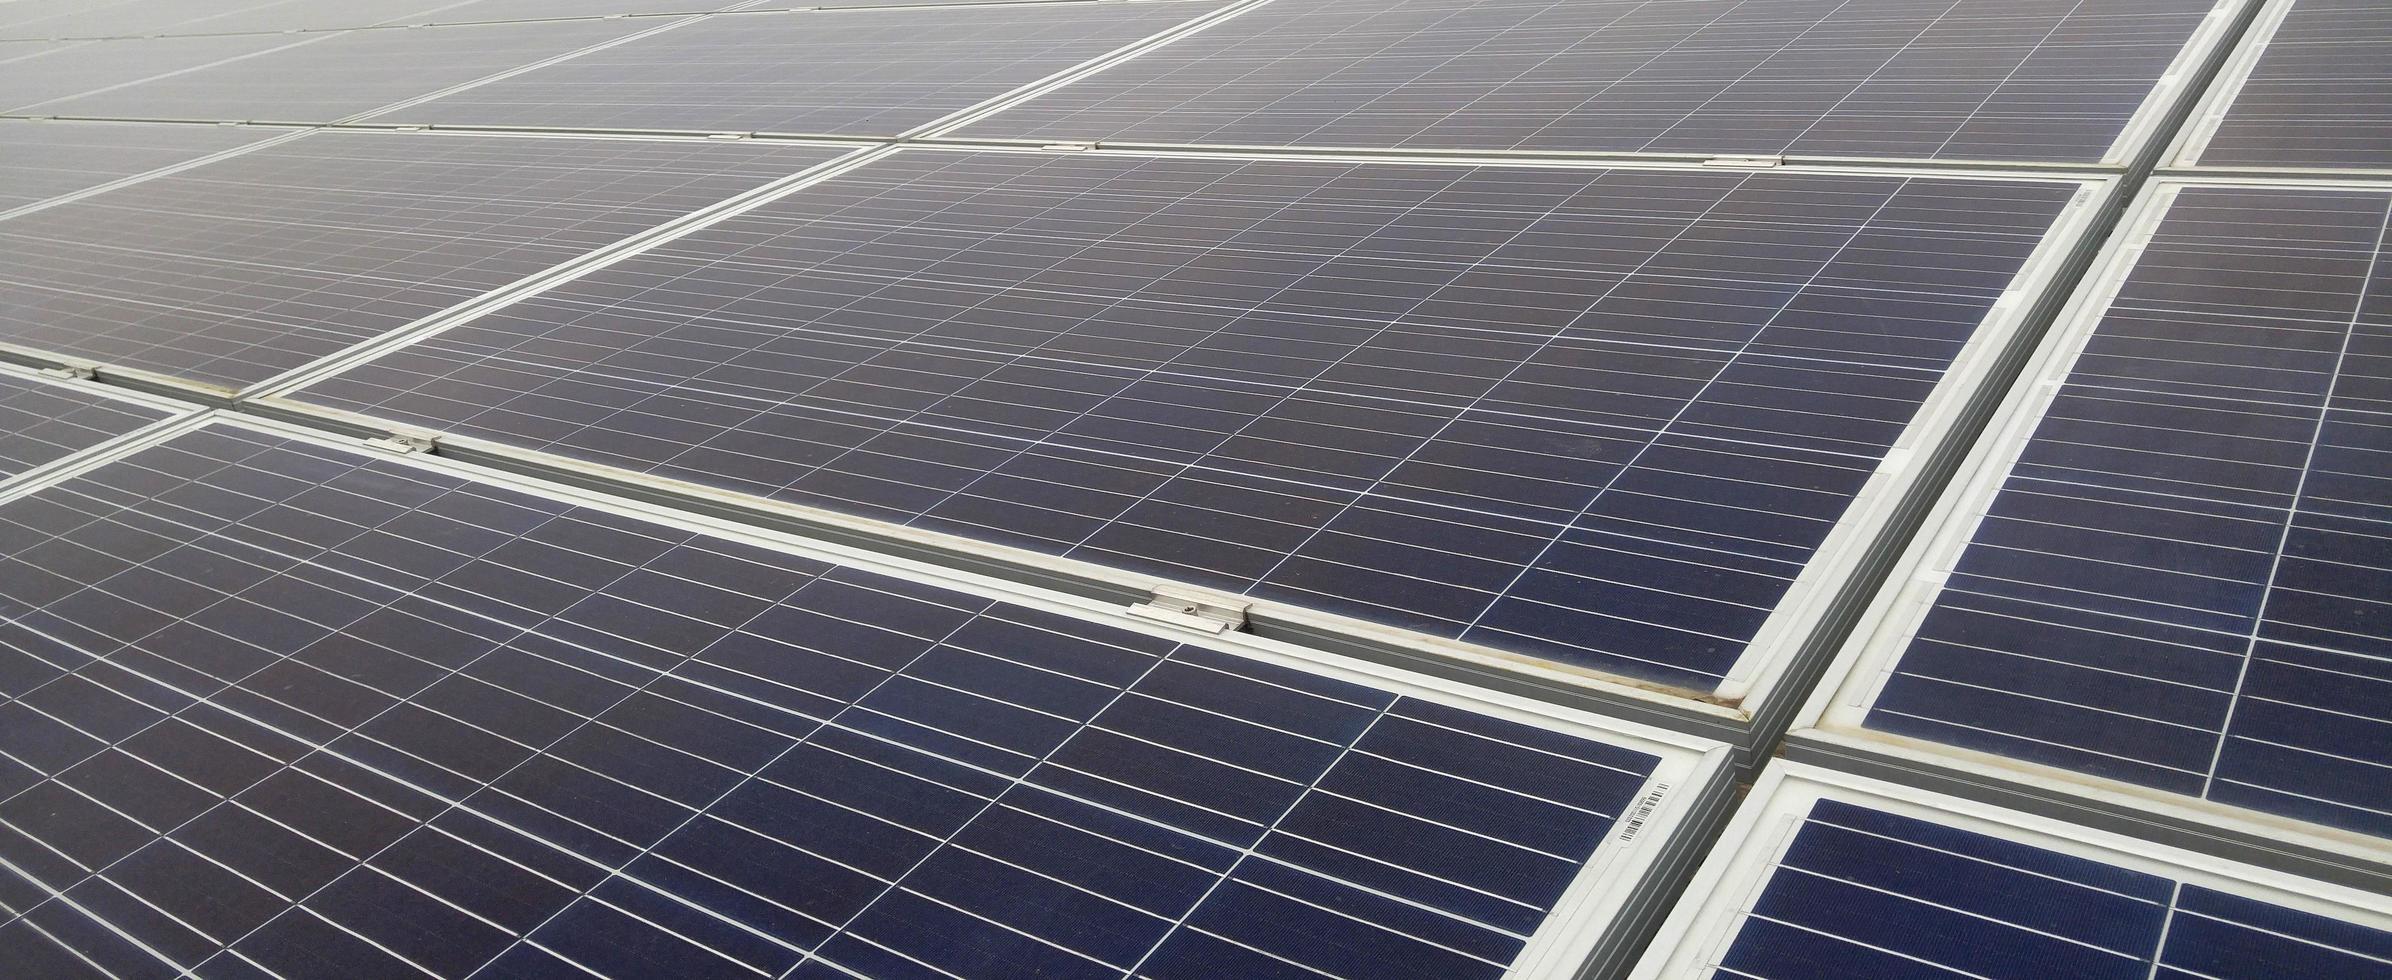 gros plan de modules solaires photo